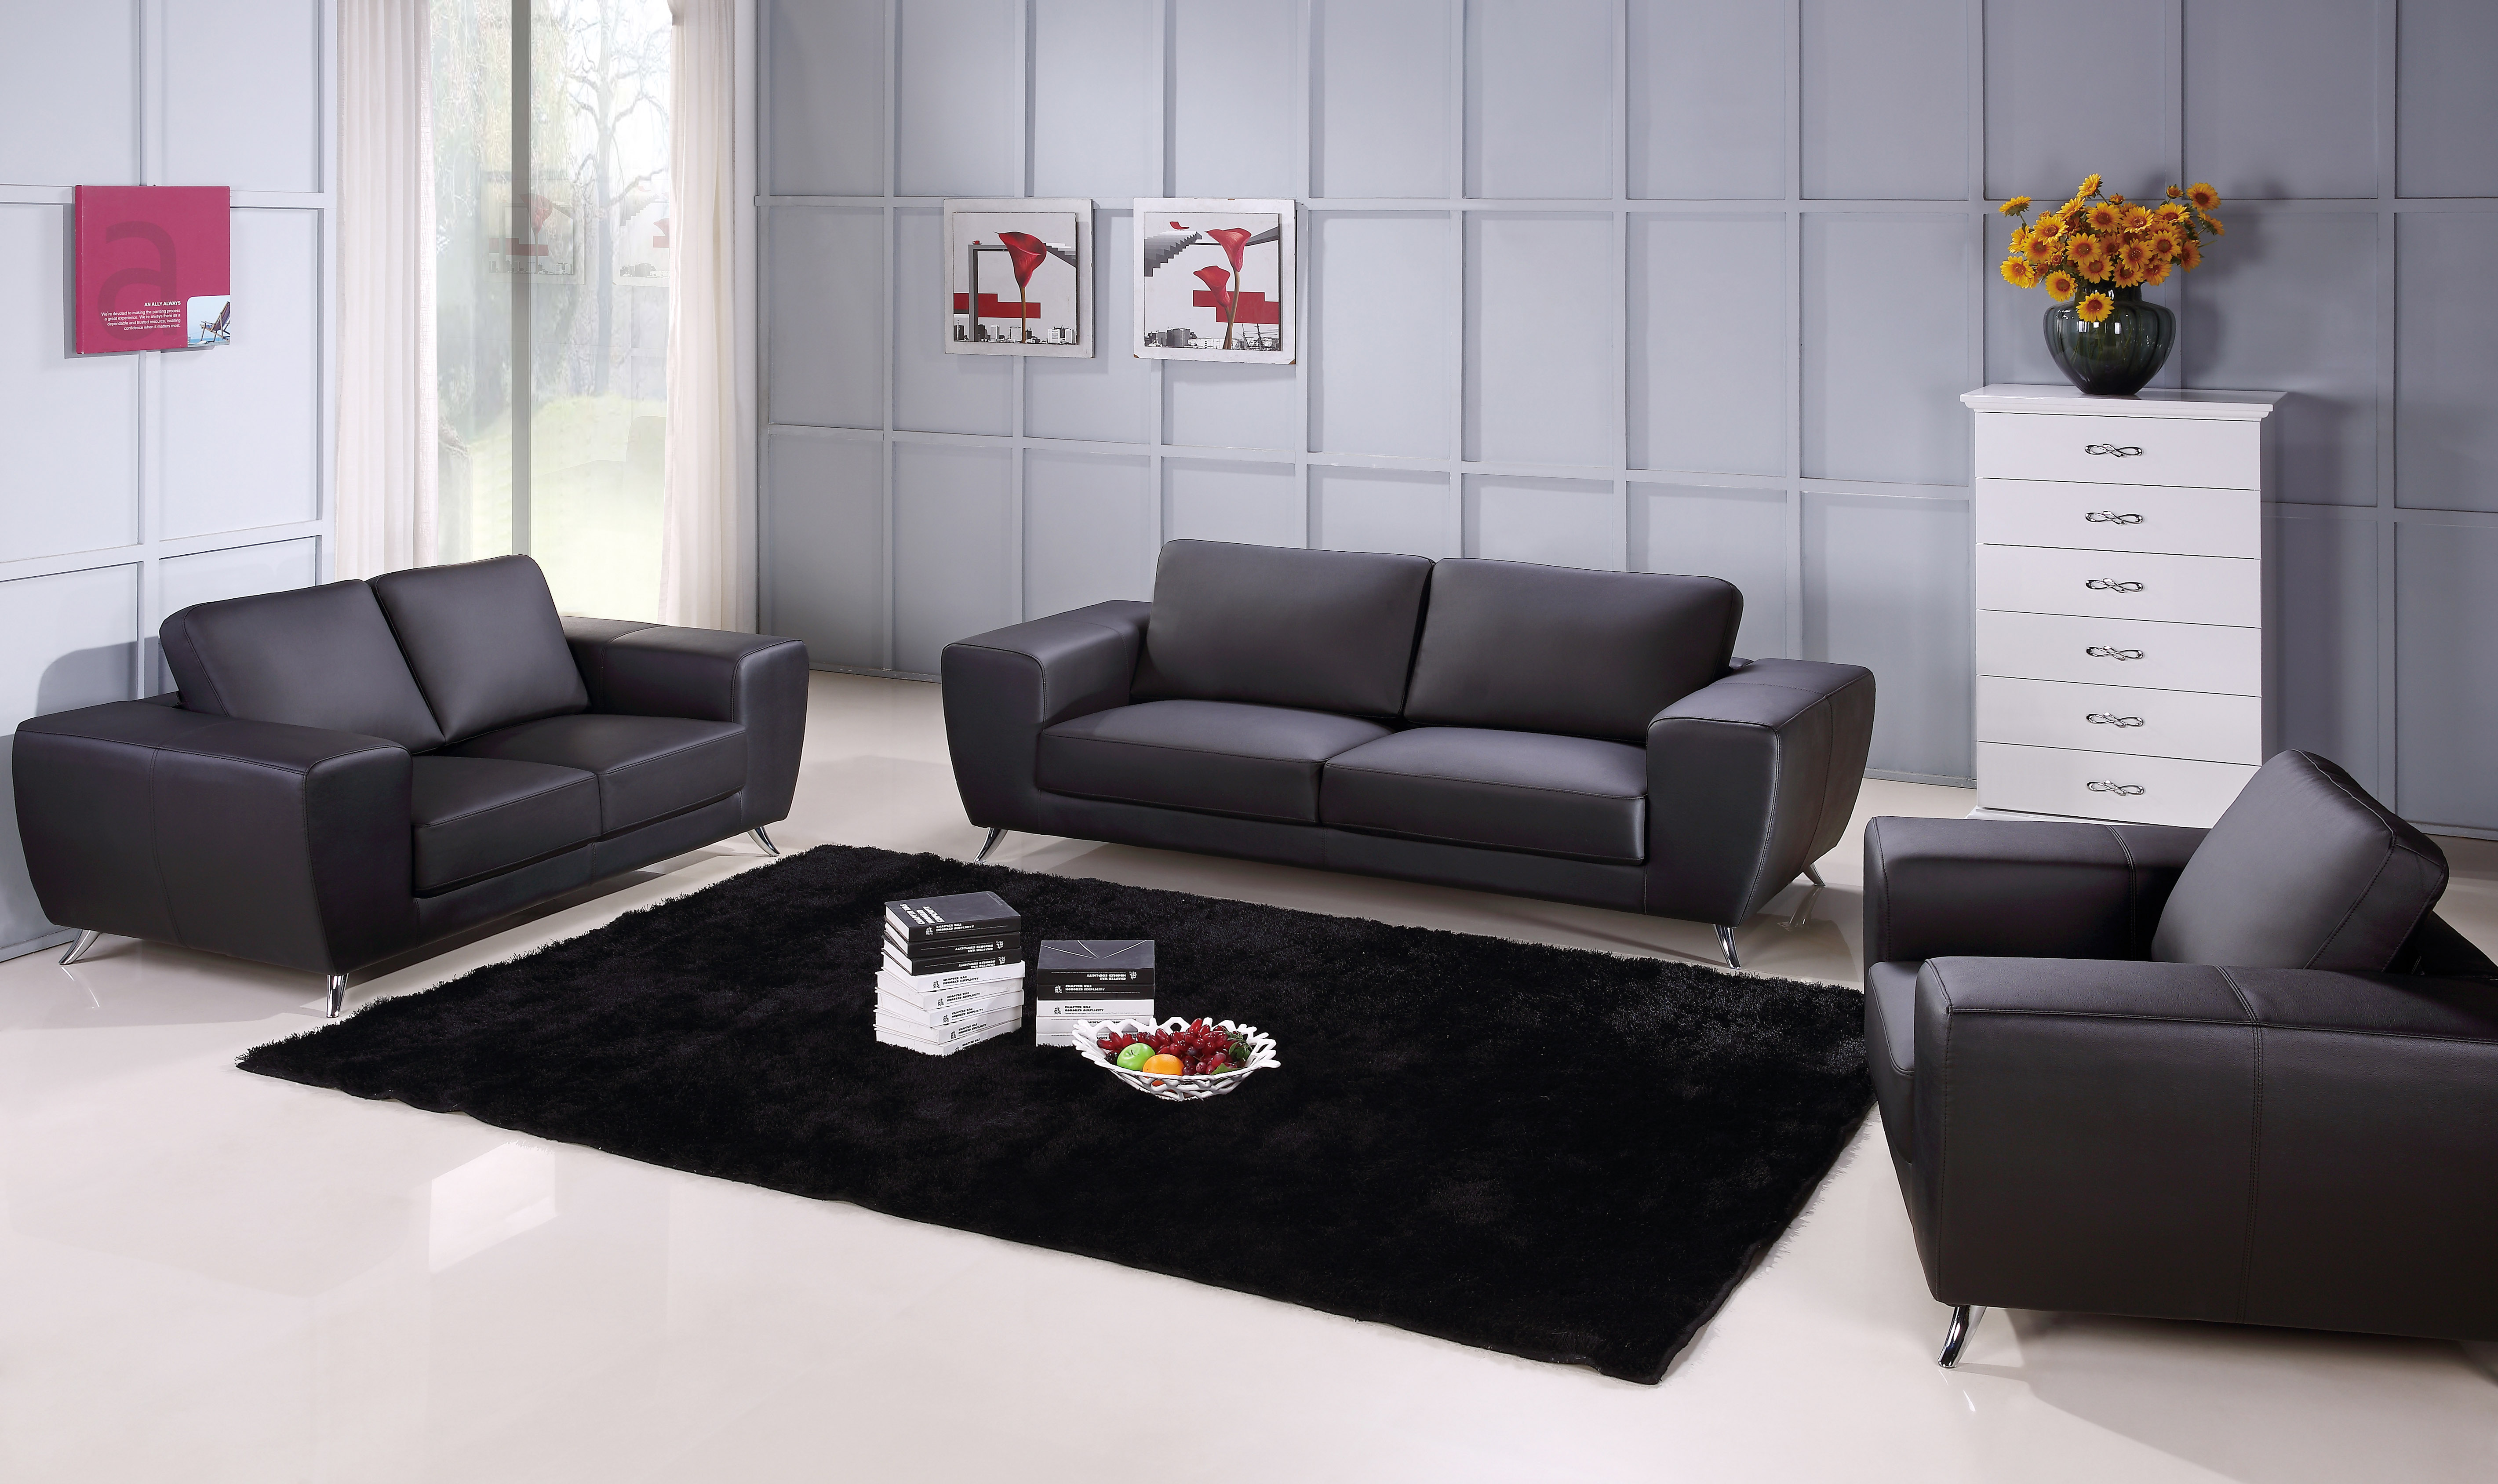 Unique Sofa Set Upholstered In Black Leather Fresno